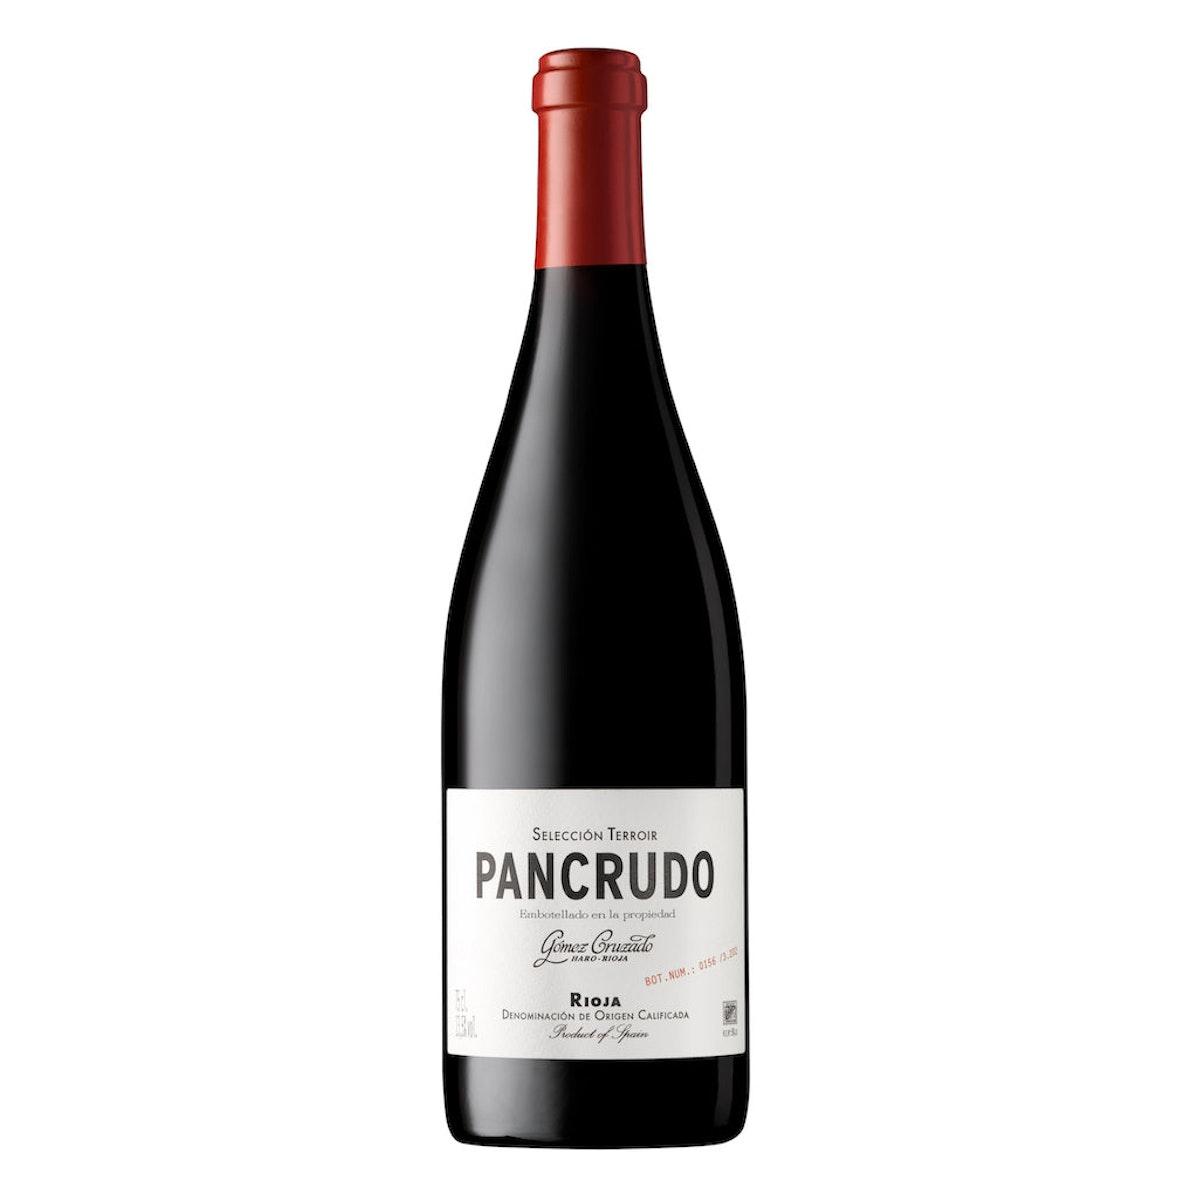 Magnum Rioja Pancrudo, 2018